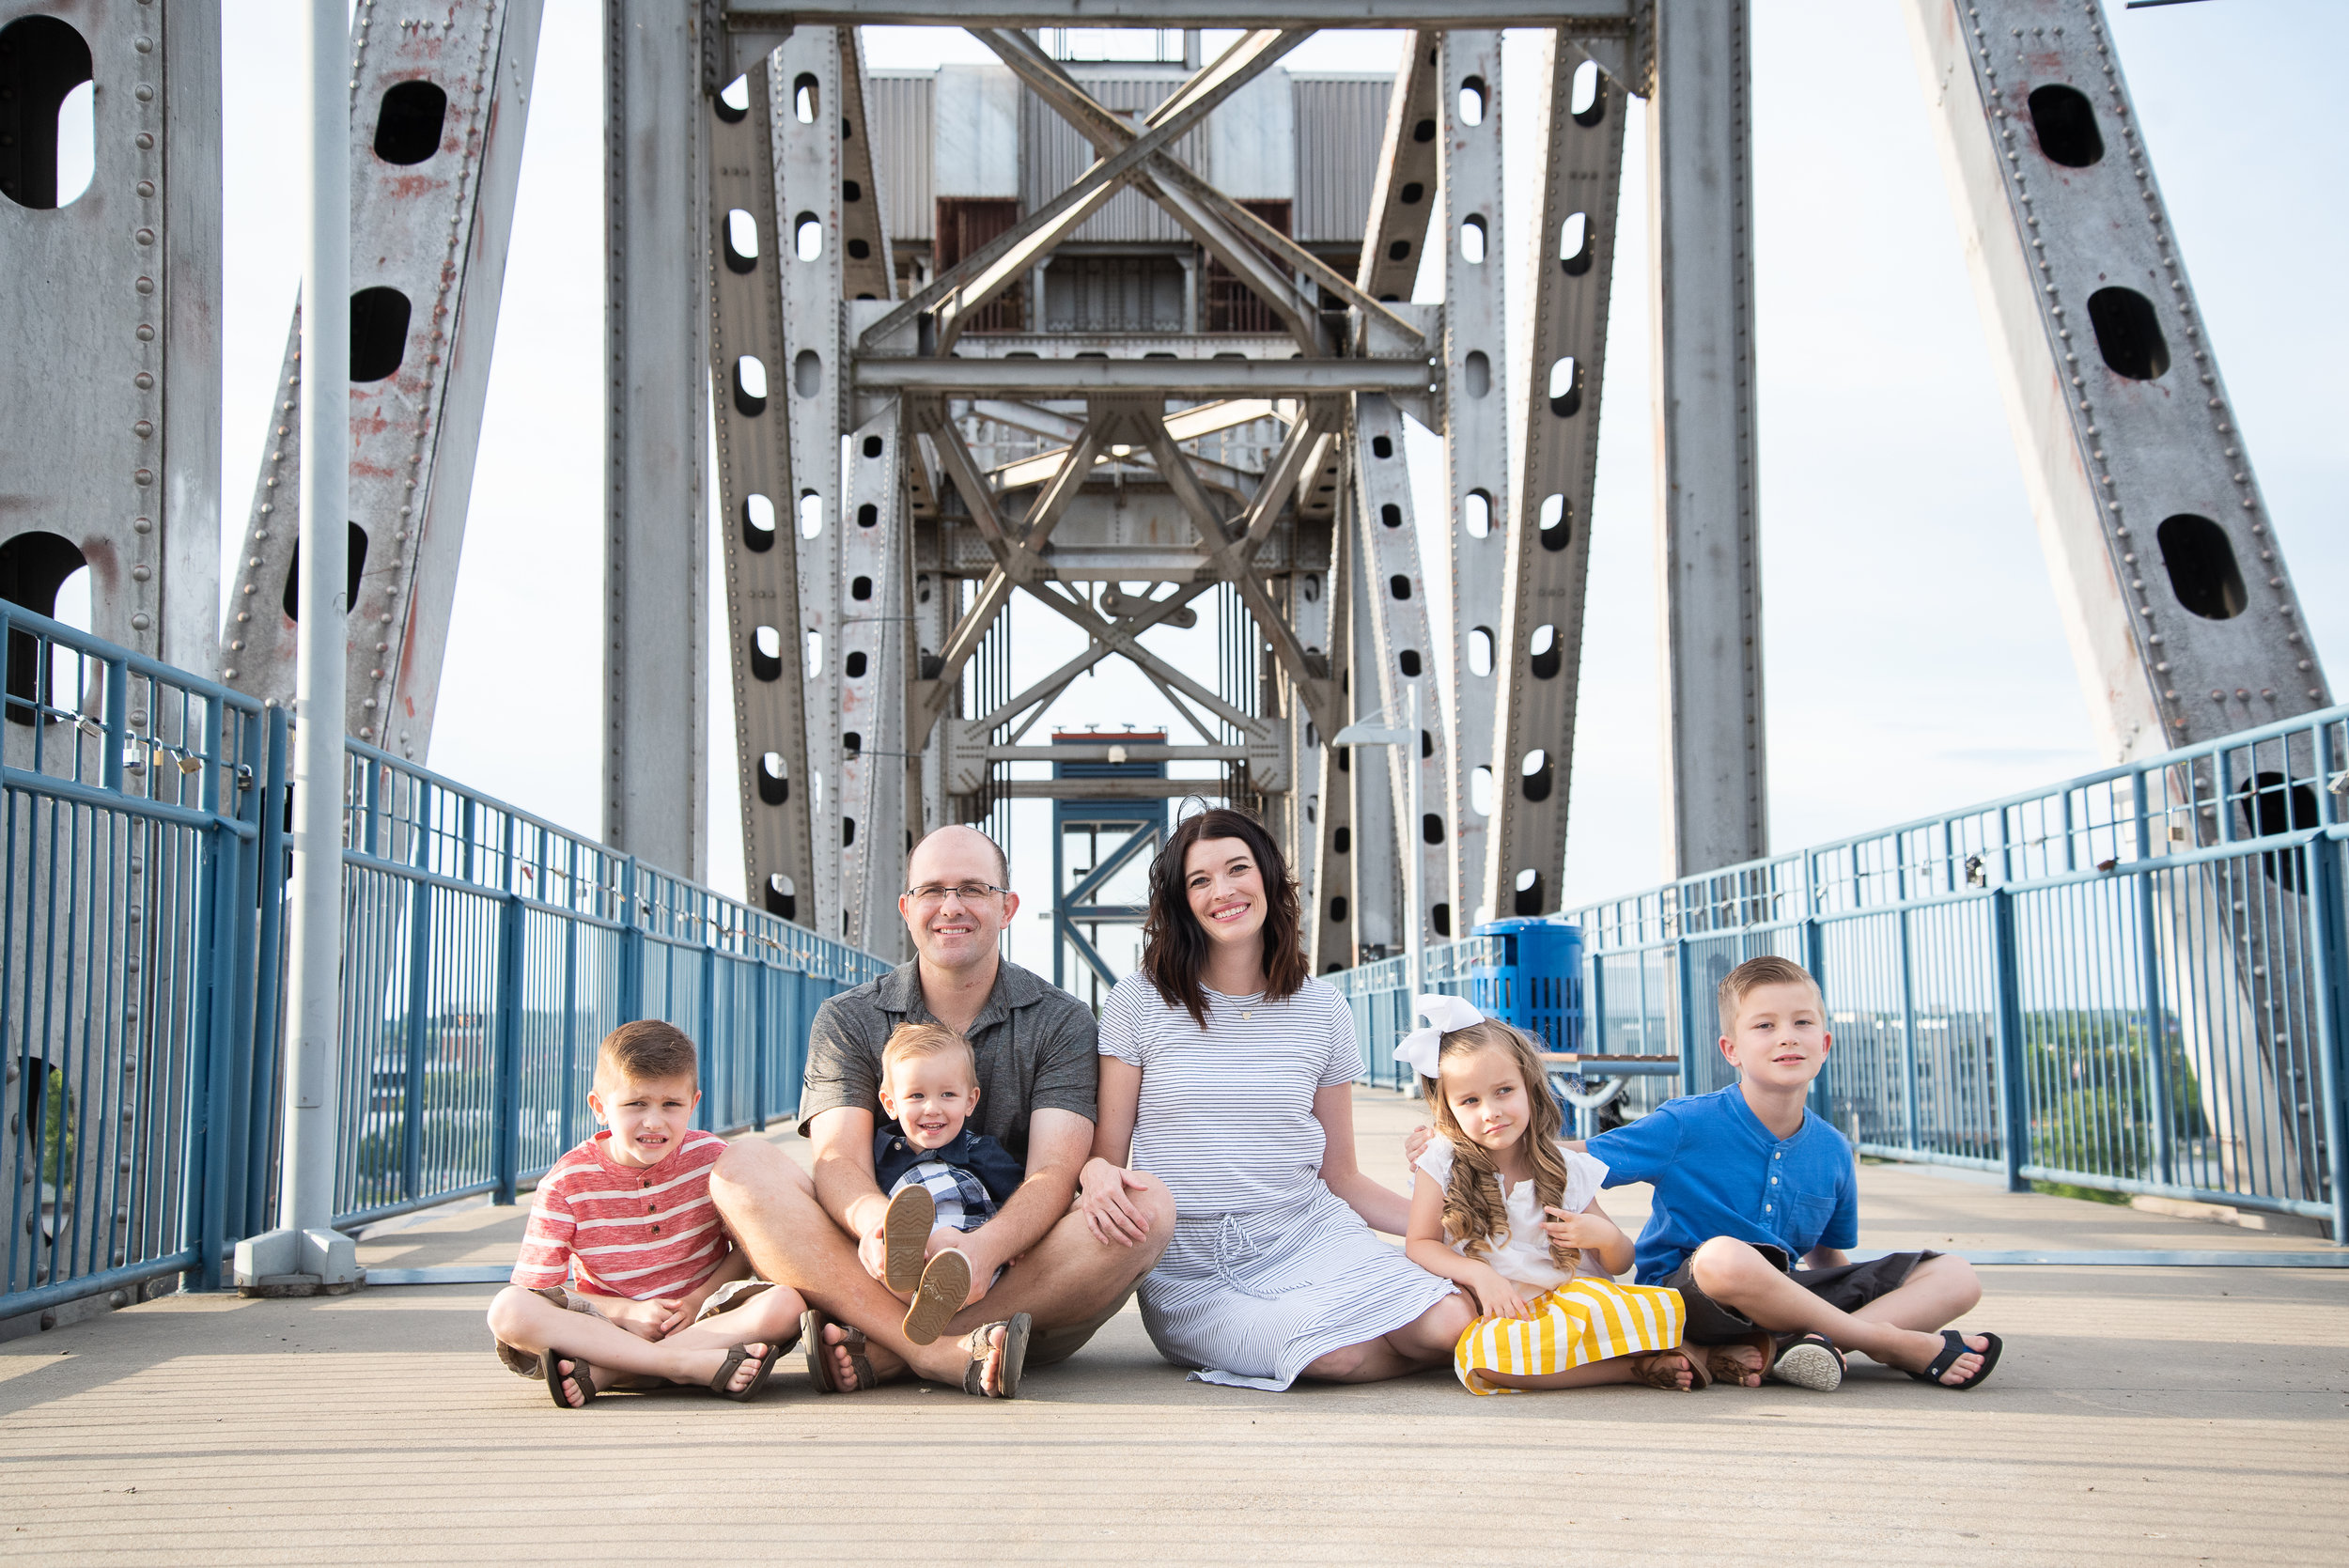 littlerockfamilyportraits.jpg